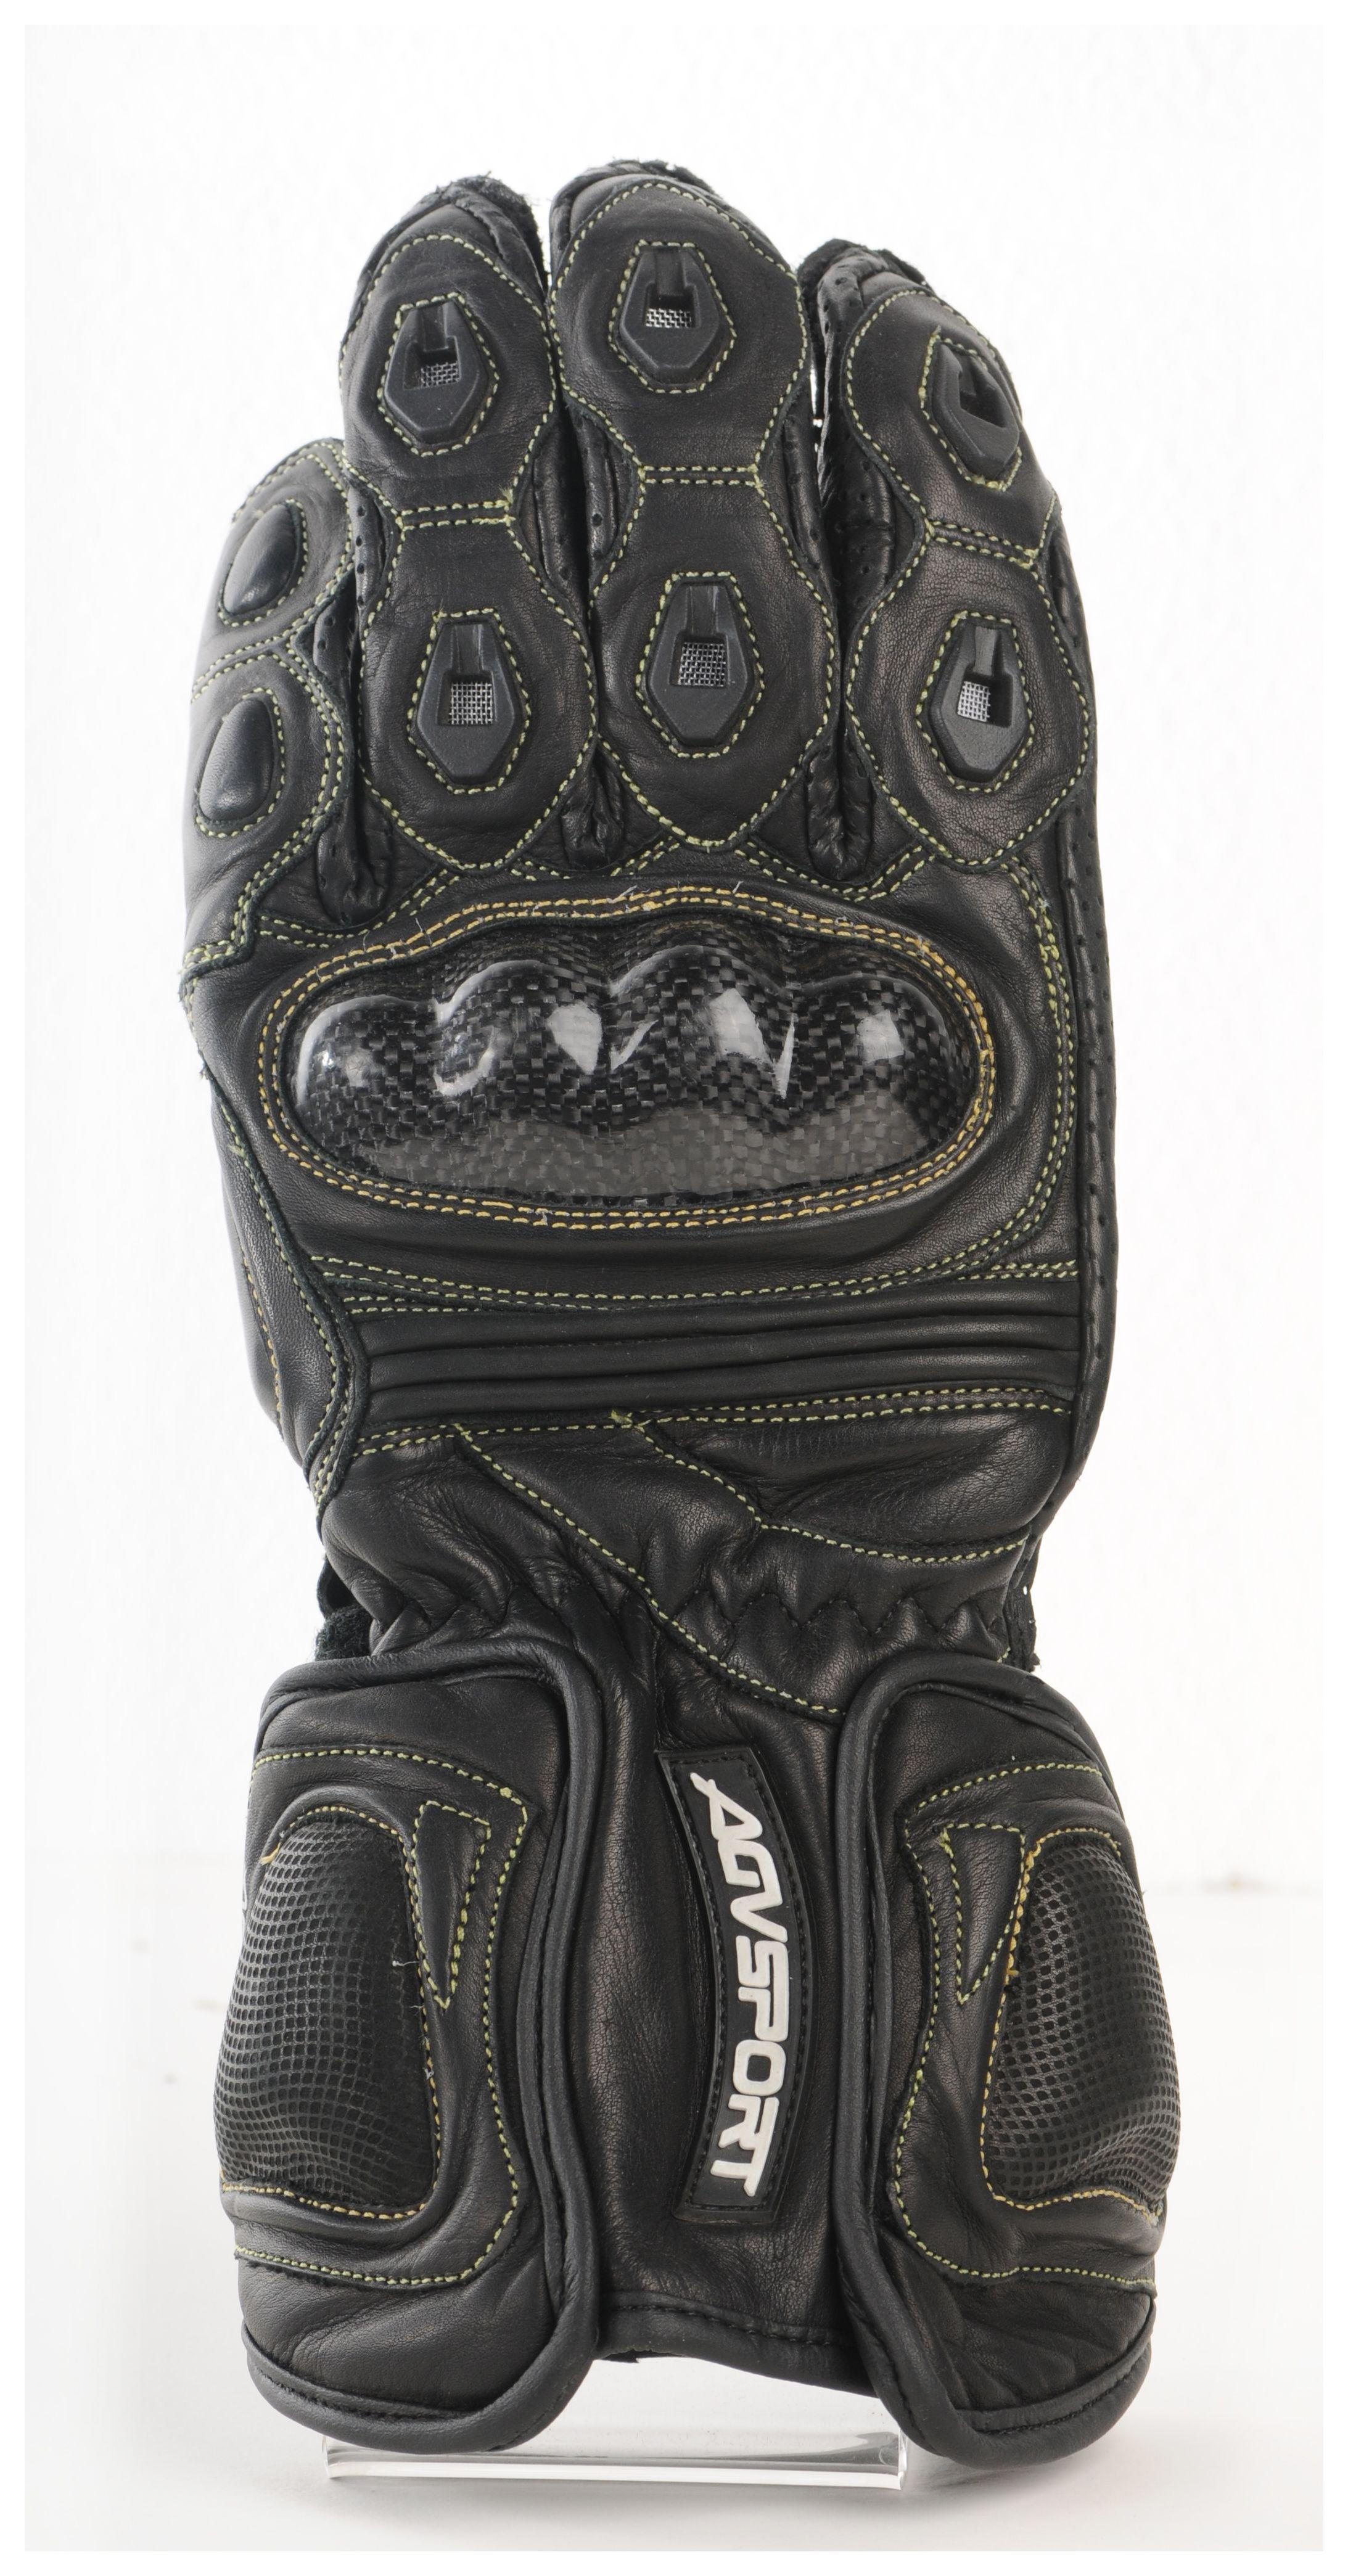 Motorcycle gloves distributor - Motorcycle Gloves Distributor 37